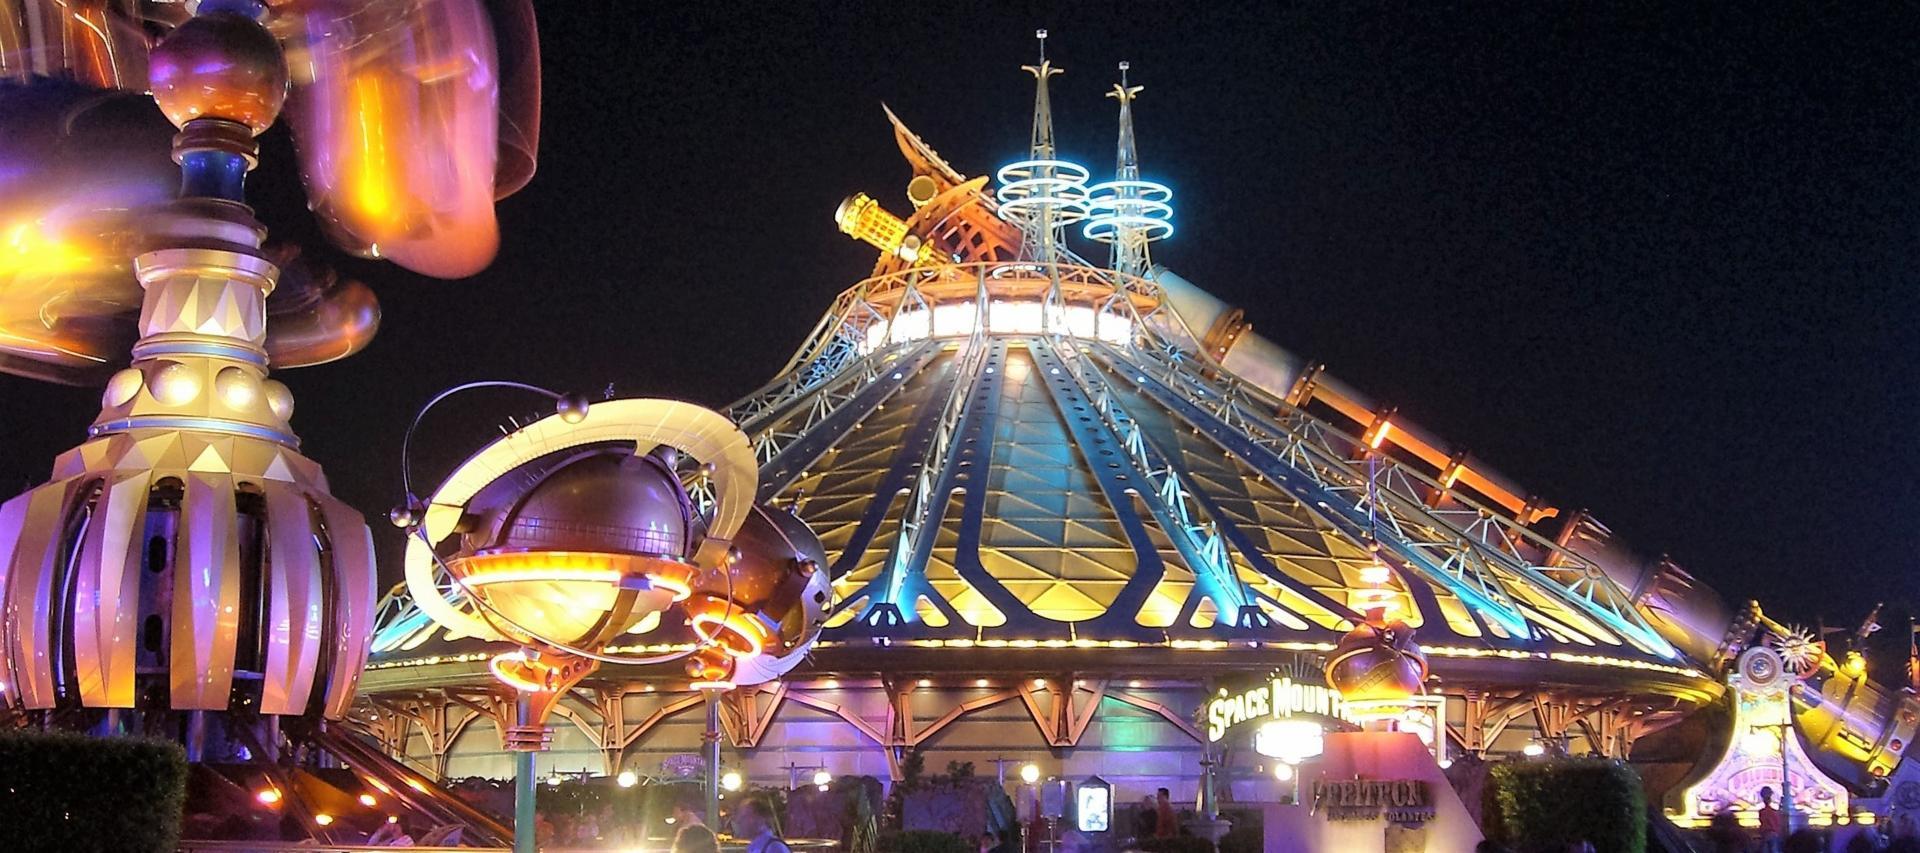 Hyperspace Attraction at Disneyland Paris